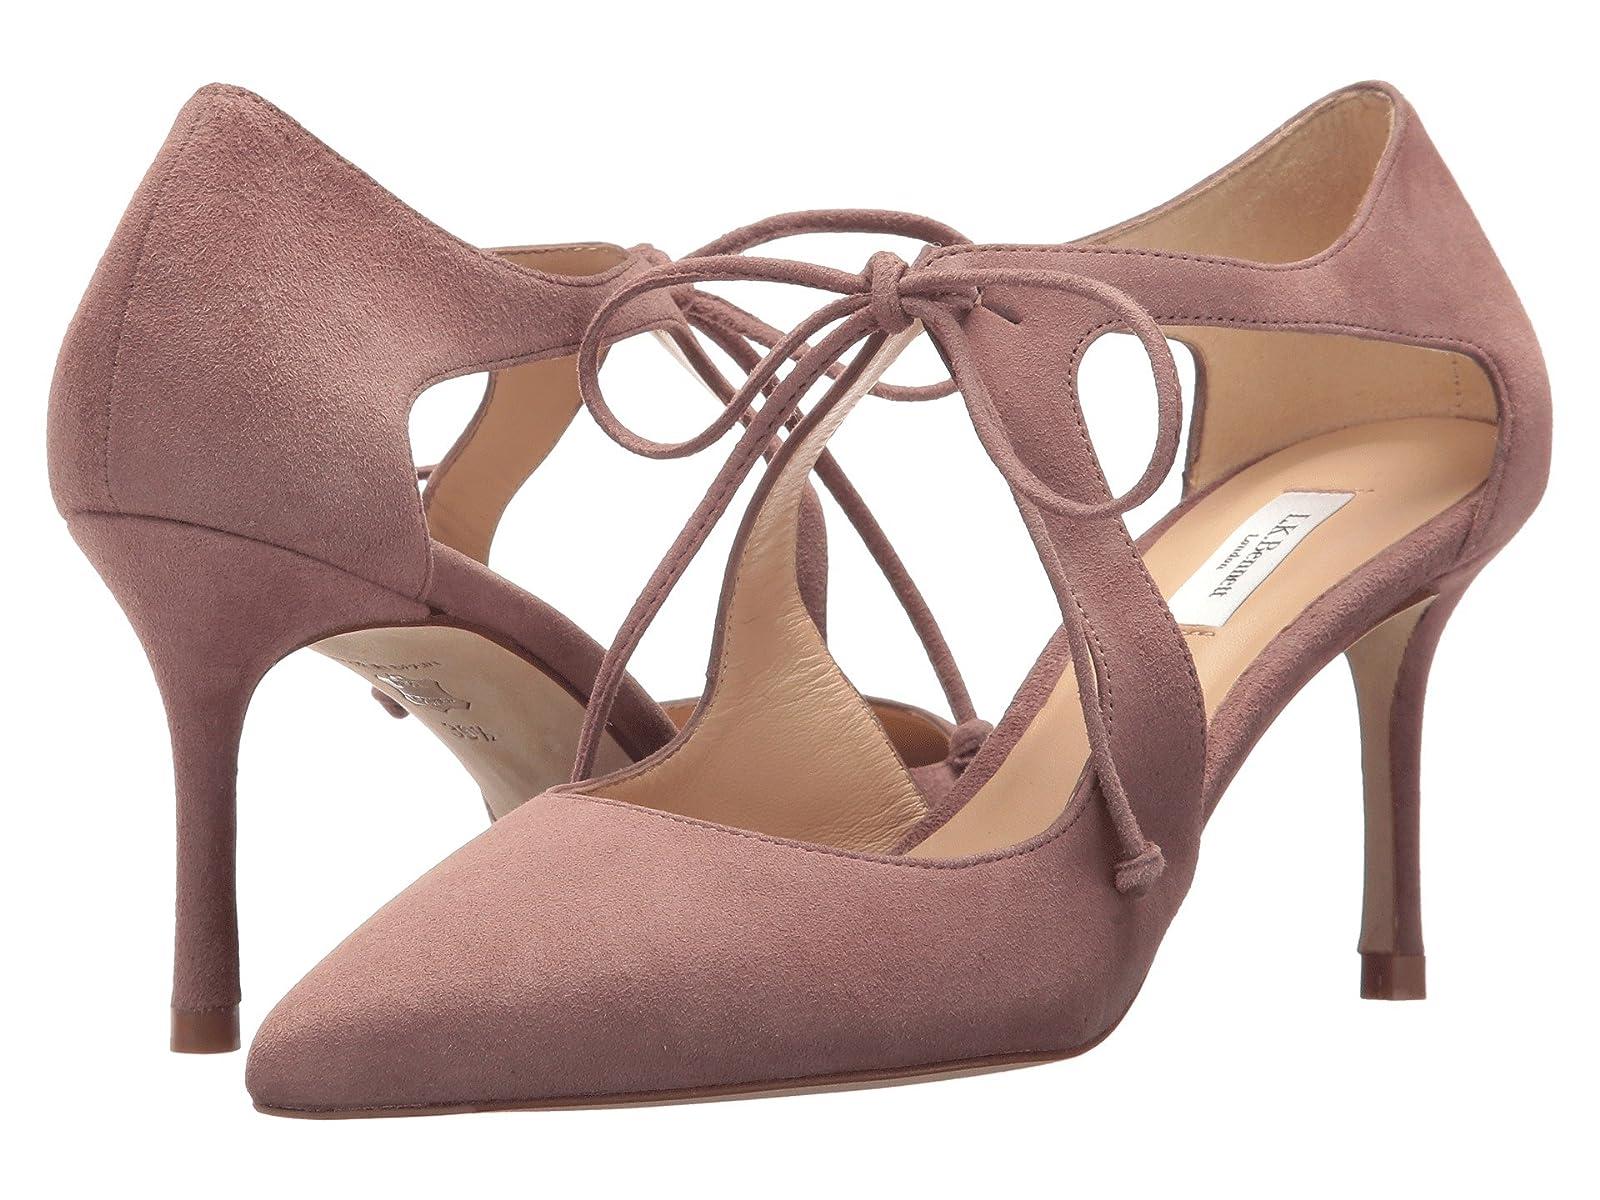 L.K. Bennett HyelinCheap and distinctive eye-catching shoes